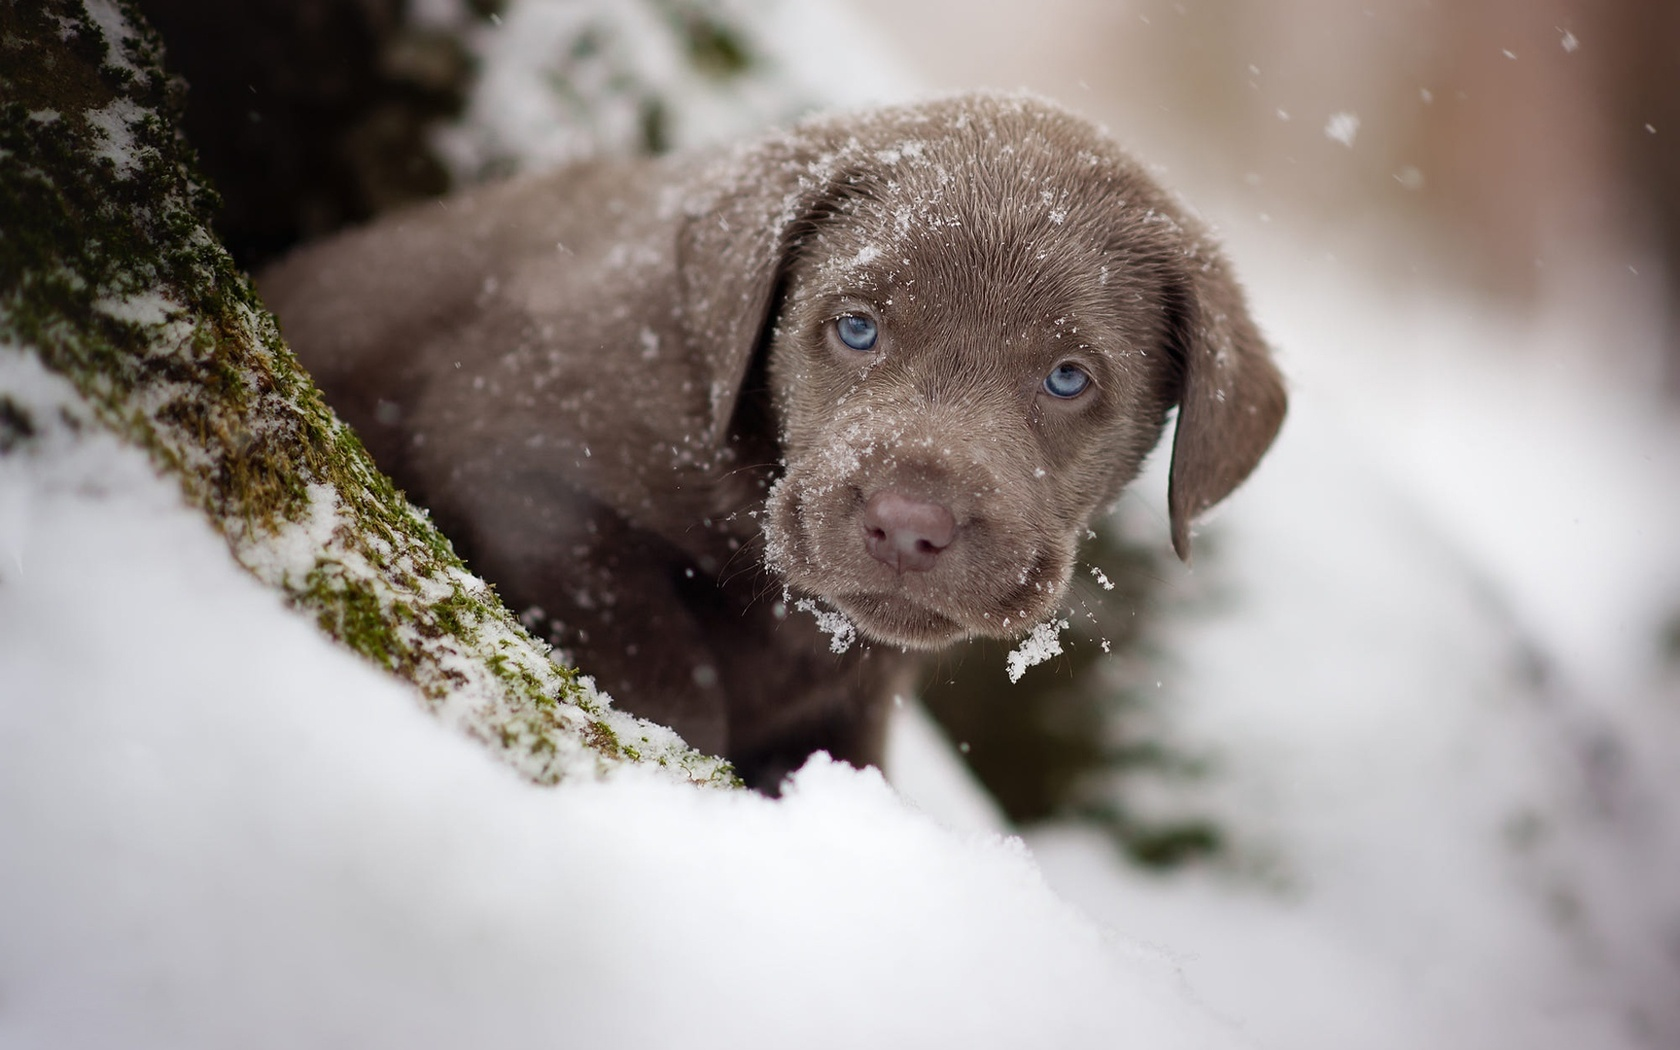 животное, собака, щенок, взгляд, зима, снег